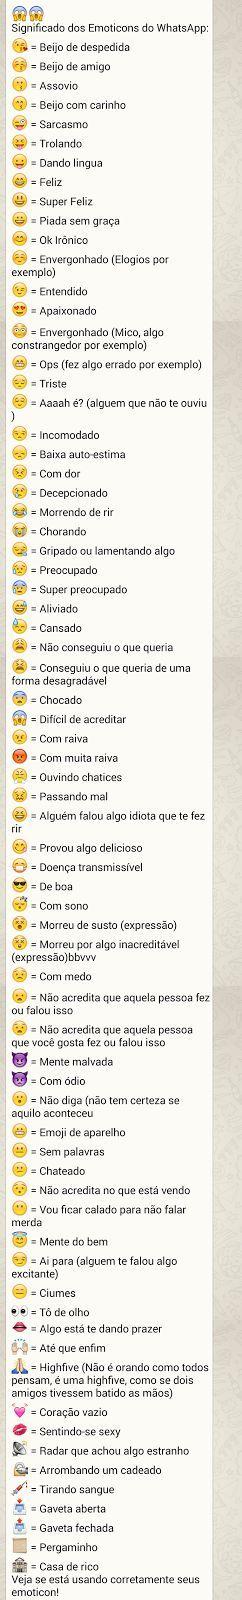 Significado De Todos Emojis Do Whatsapp